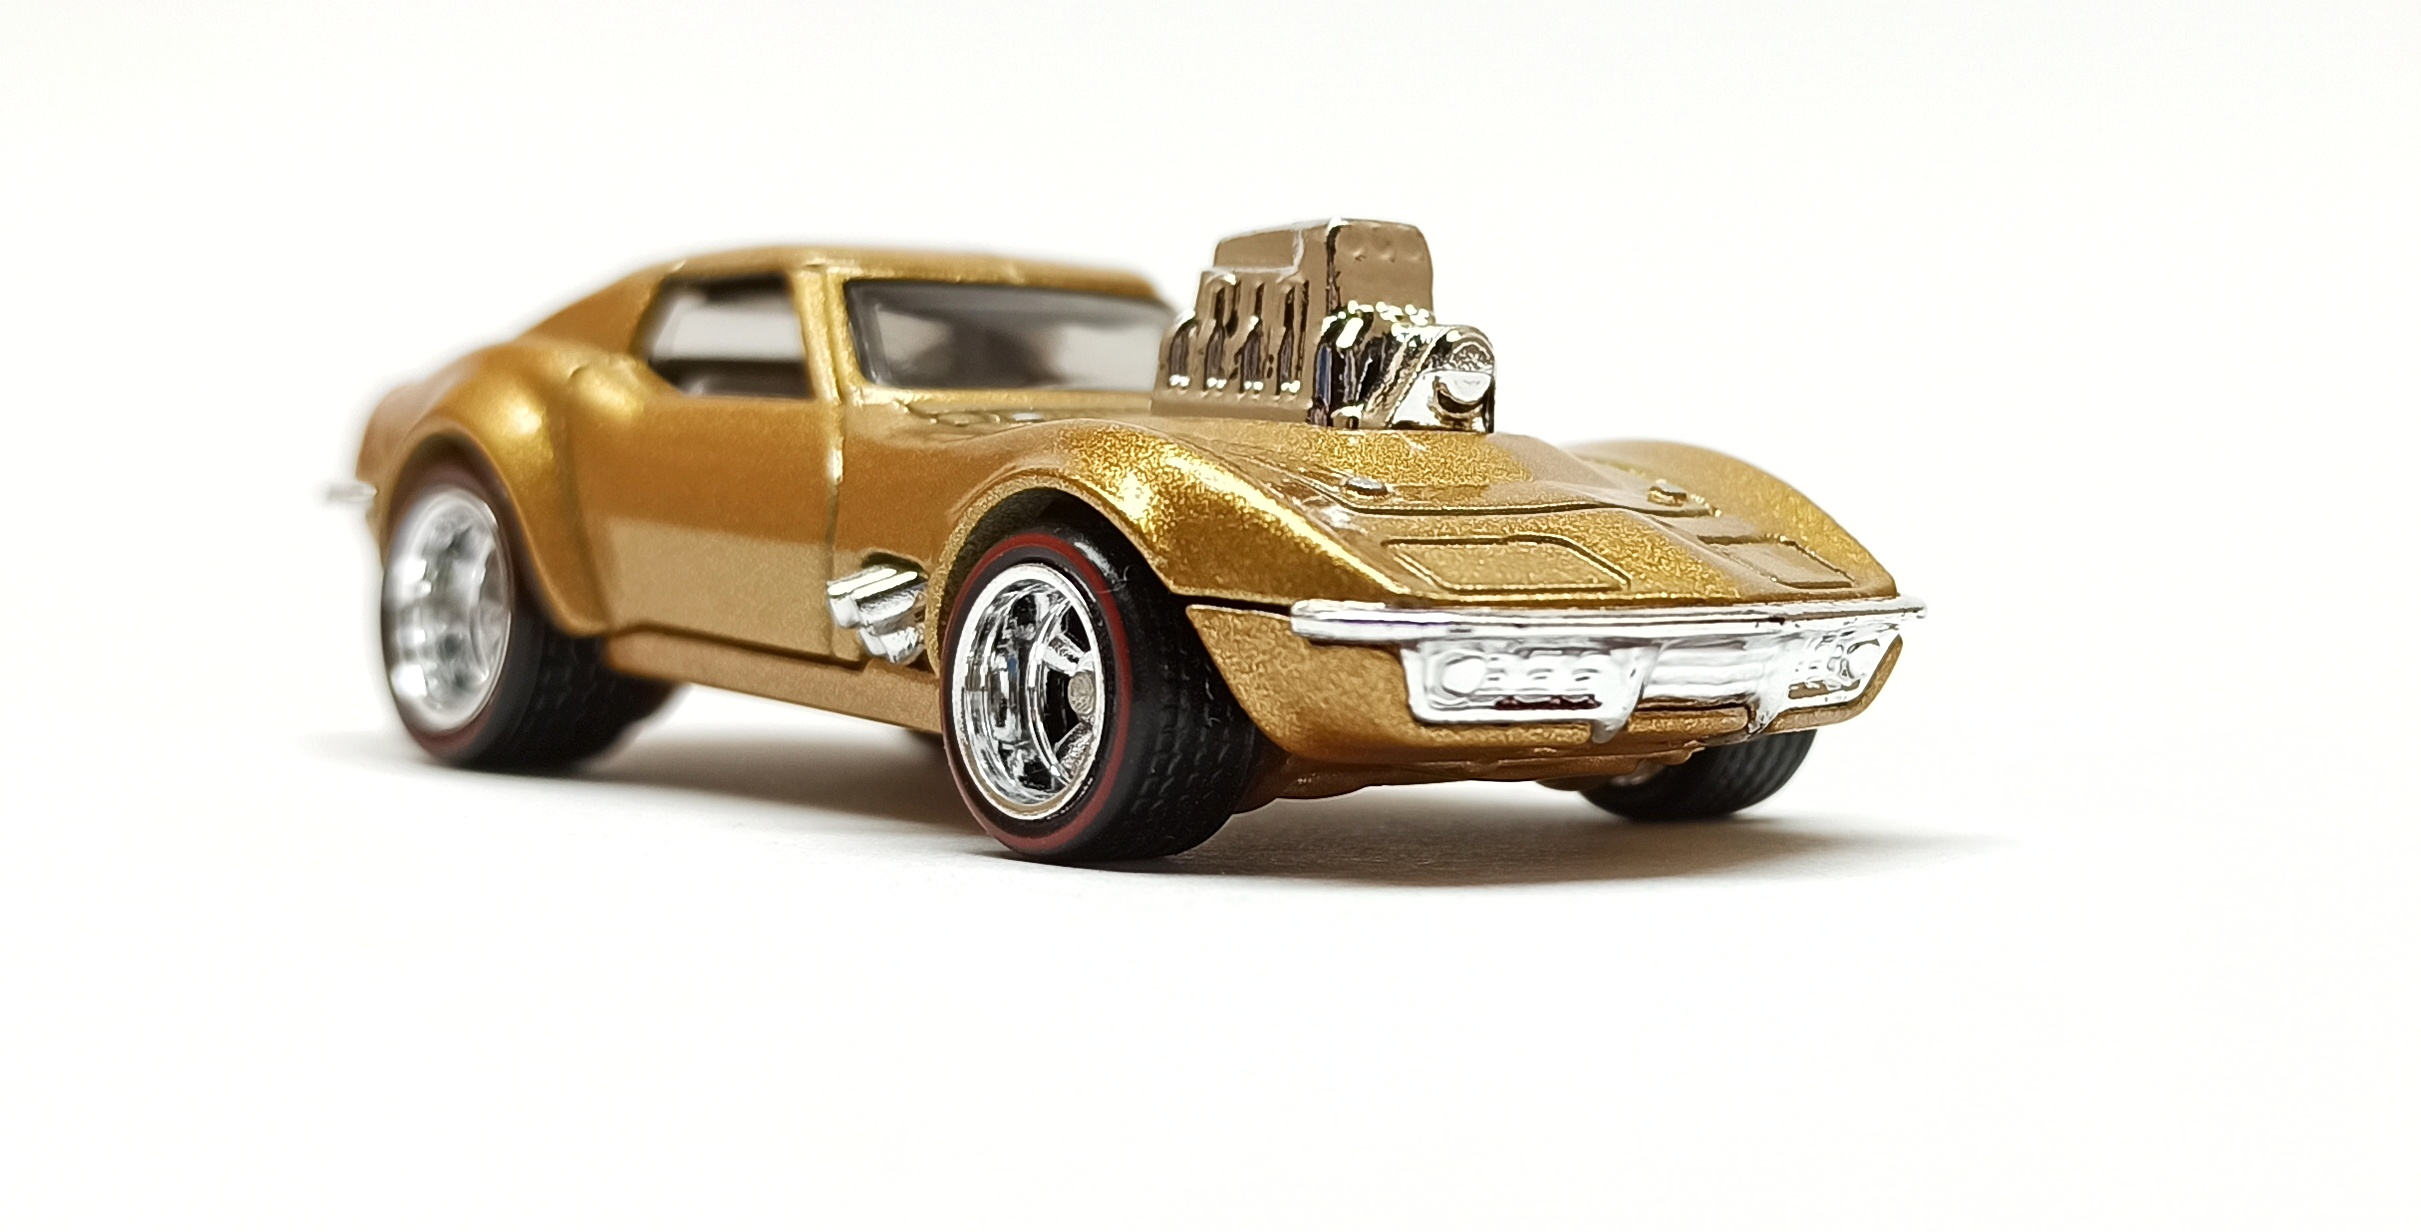 Hot Wheels '68 Corvette - Gas Monkey Garage (FLD15) 2018 Replica Entertainment metalflake gold